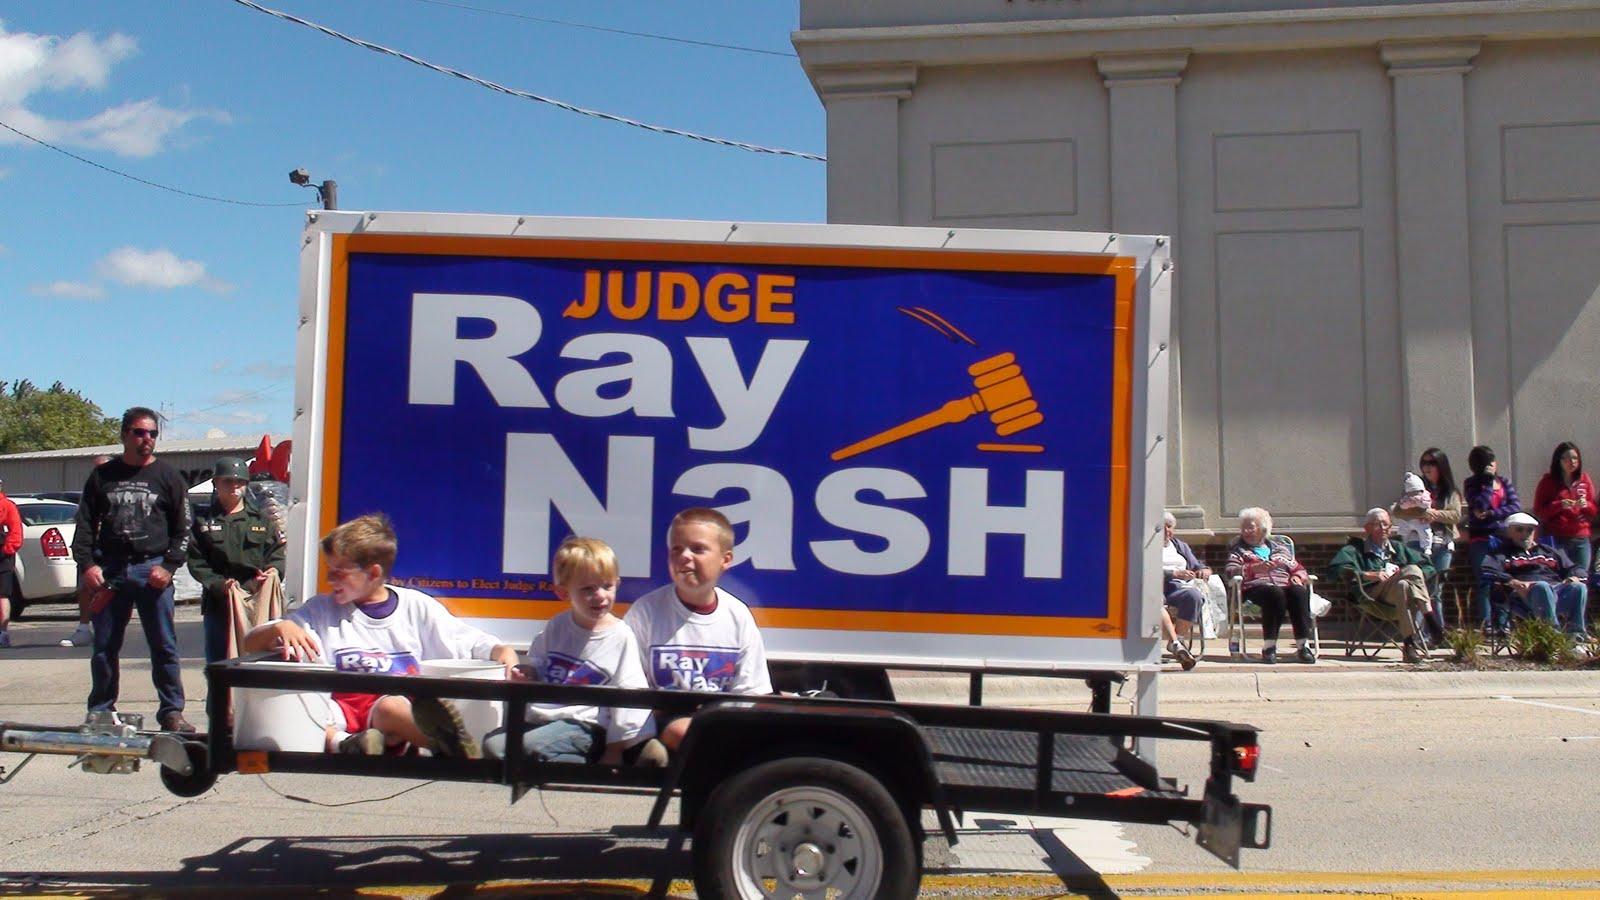 Illinois will county manhattan - Ray Nash For Judge Entry At The Manhattan Illinois Fun Days Parade